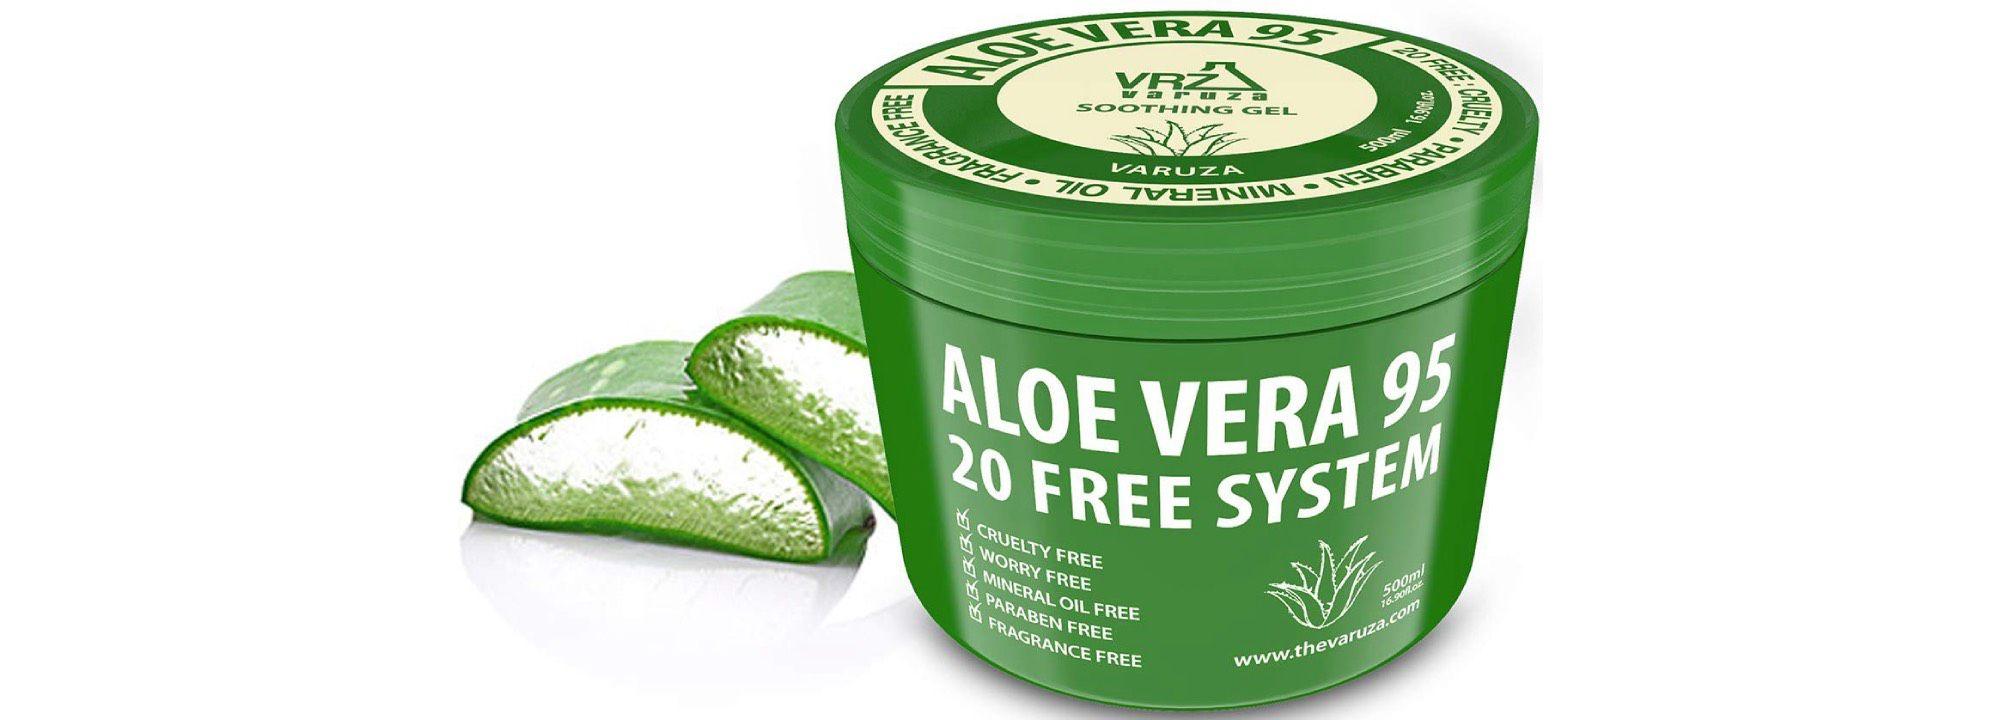 Varuza Aloe Vera Gel